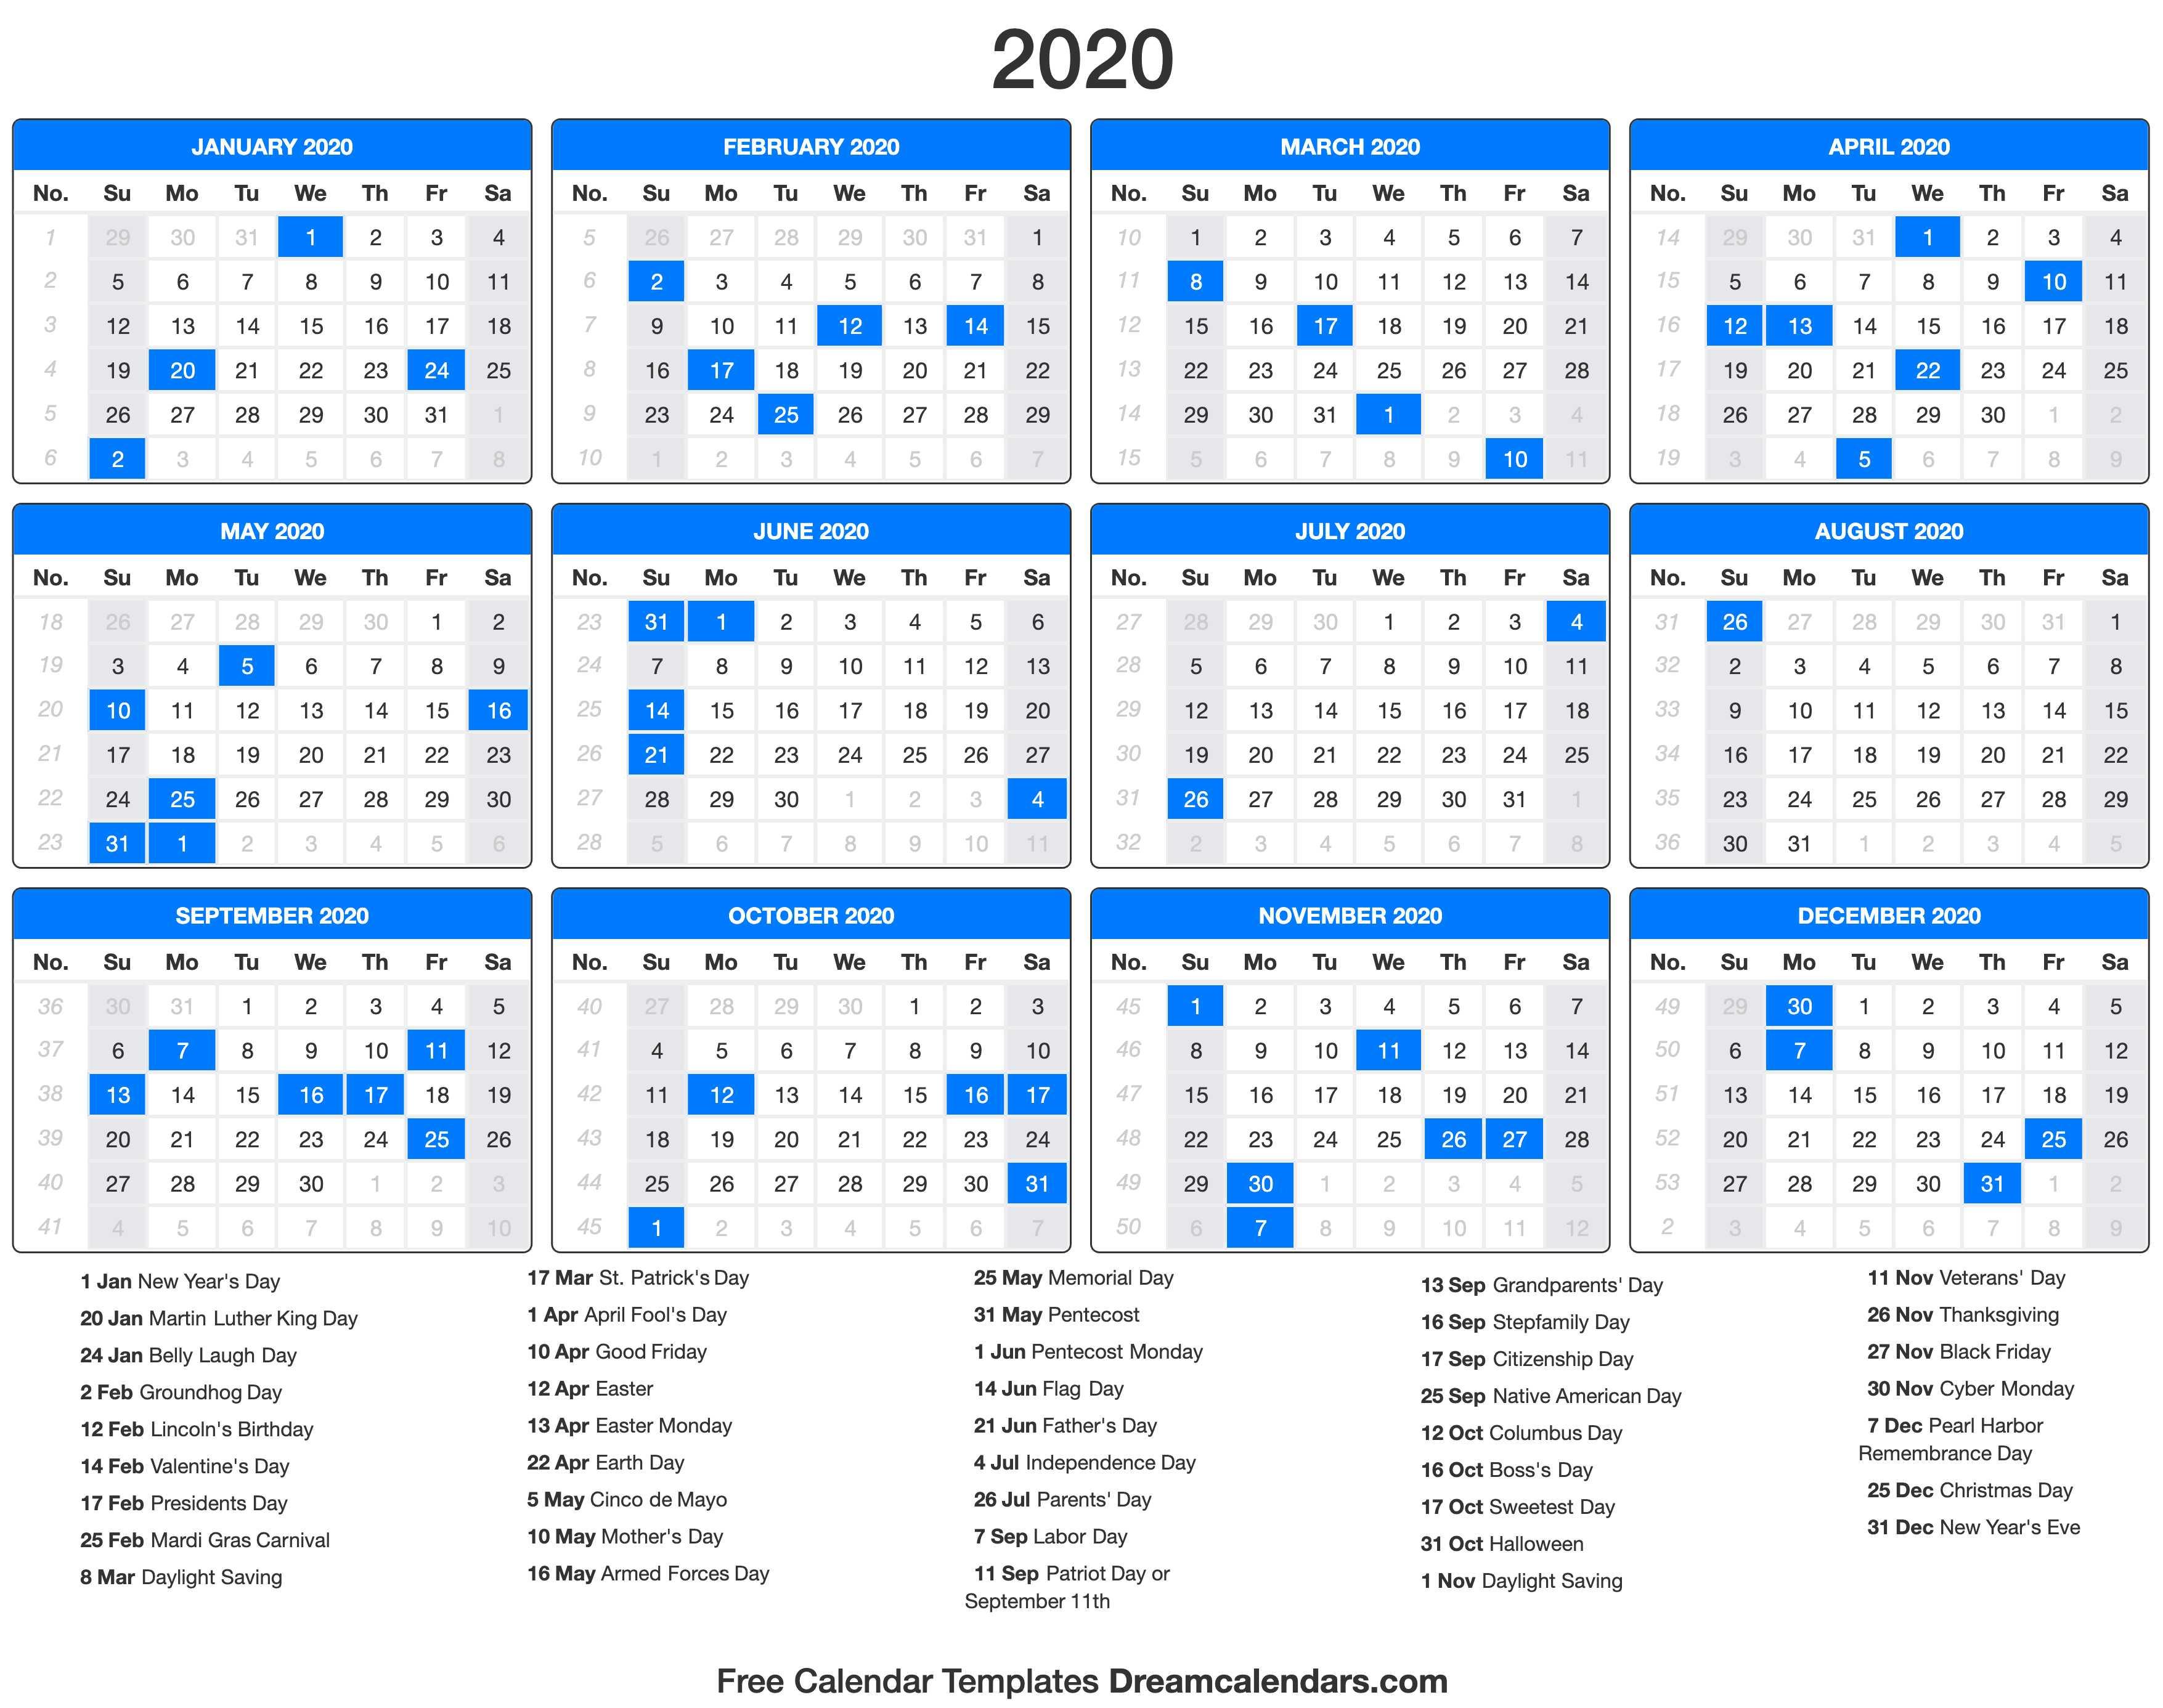 Dream Calendars - Make Your Calendar Template Blog: 2019